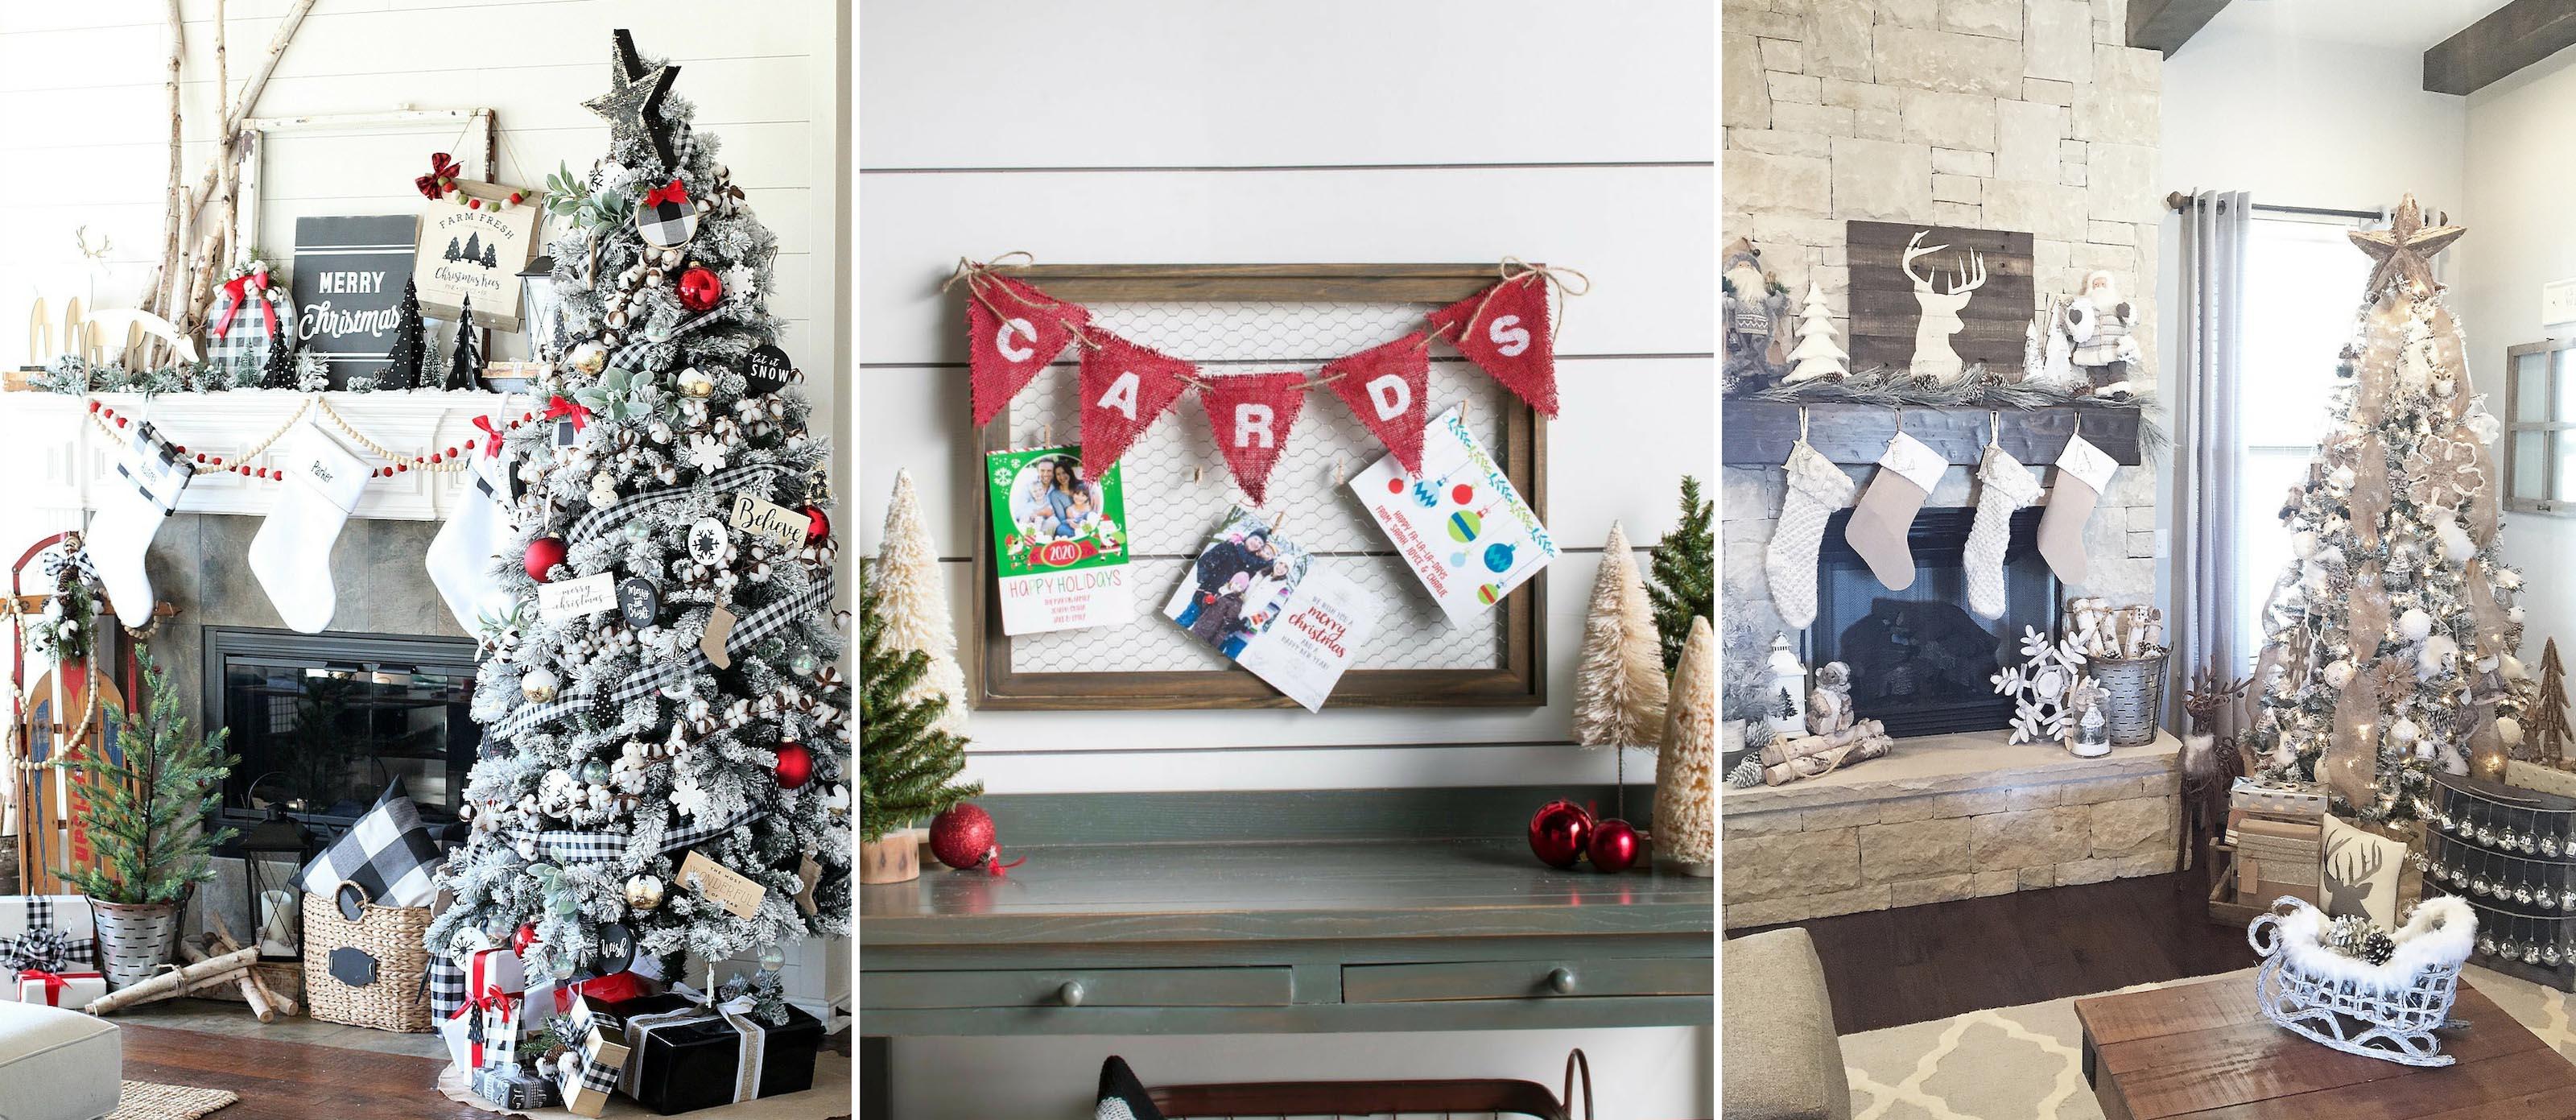 Christmas Farmhouse Decorating Ideas Joanna Gaines Would